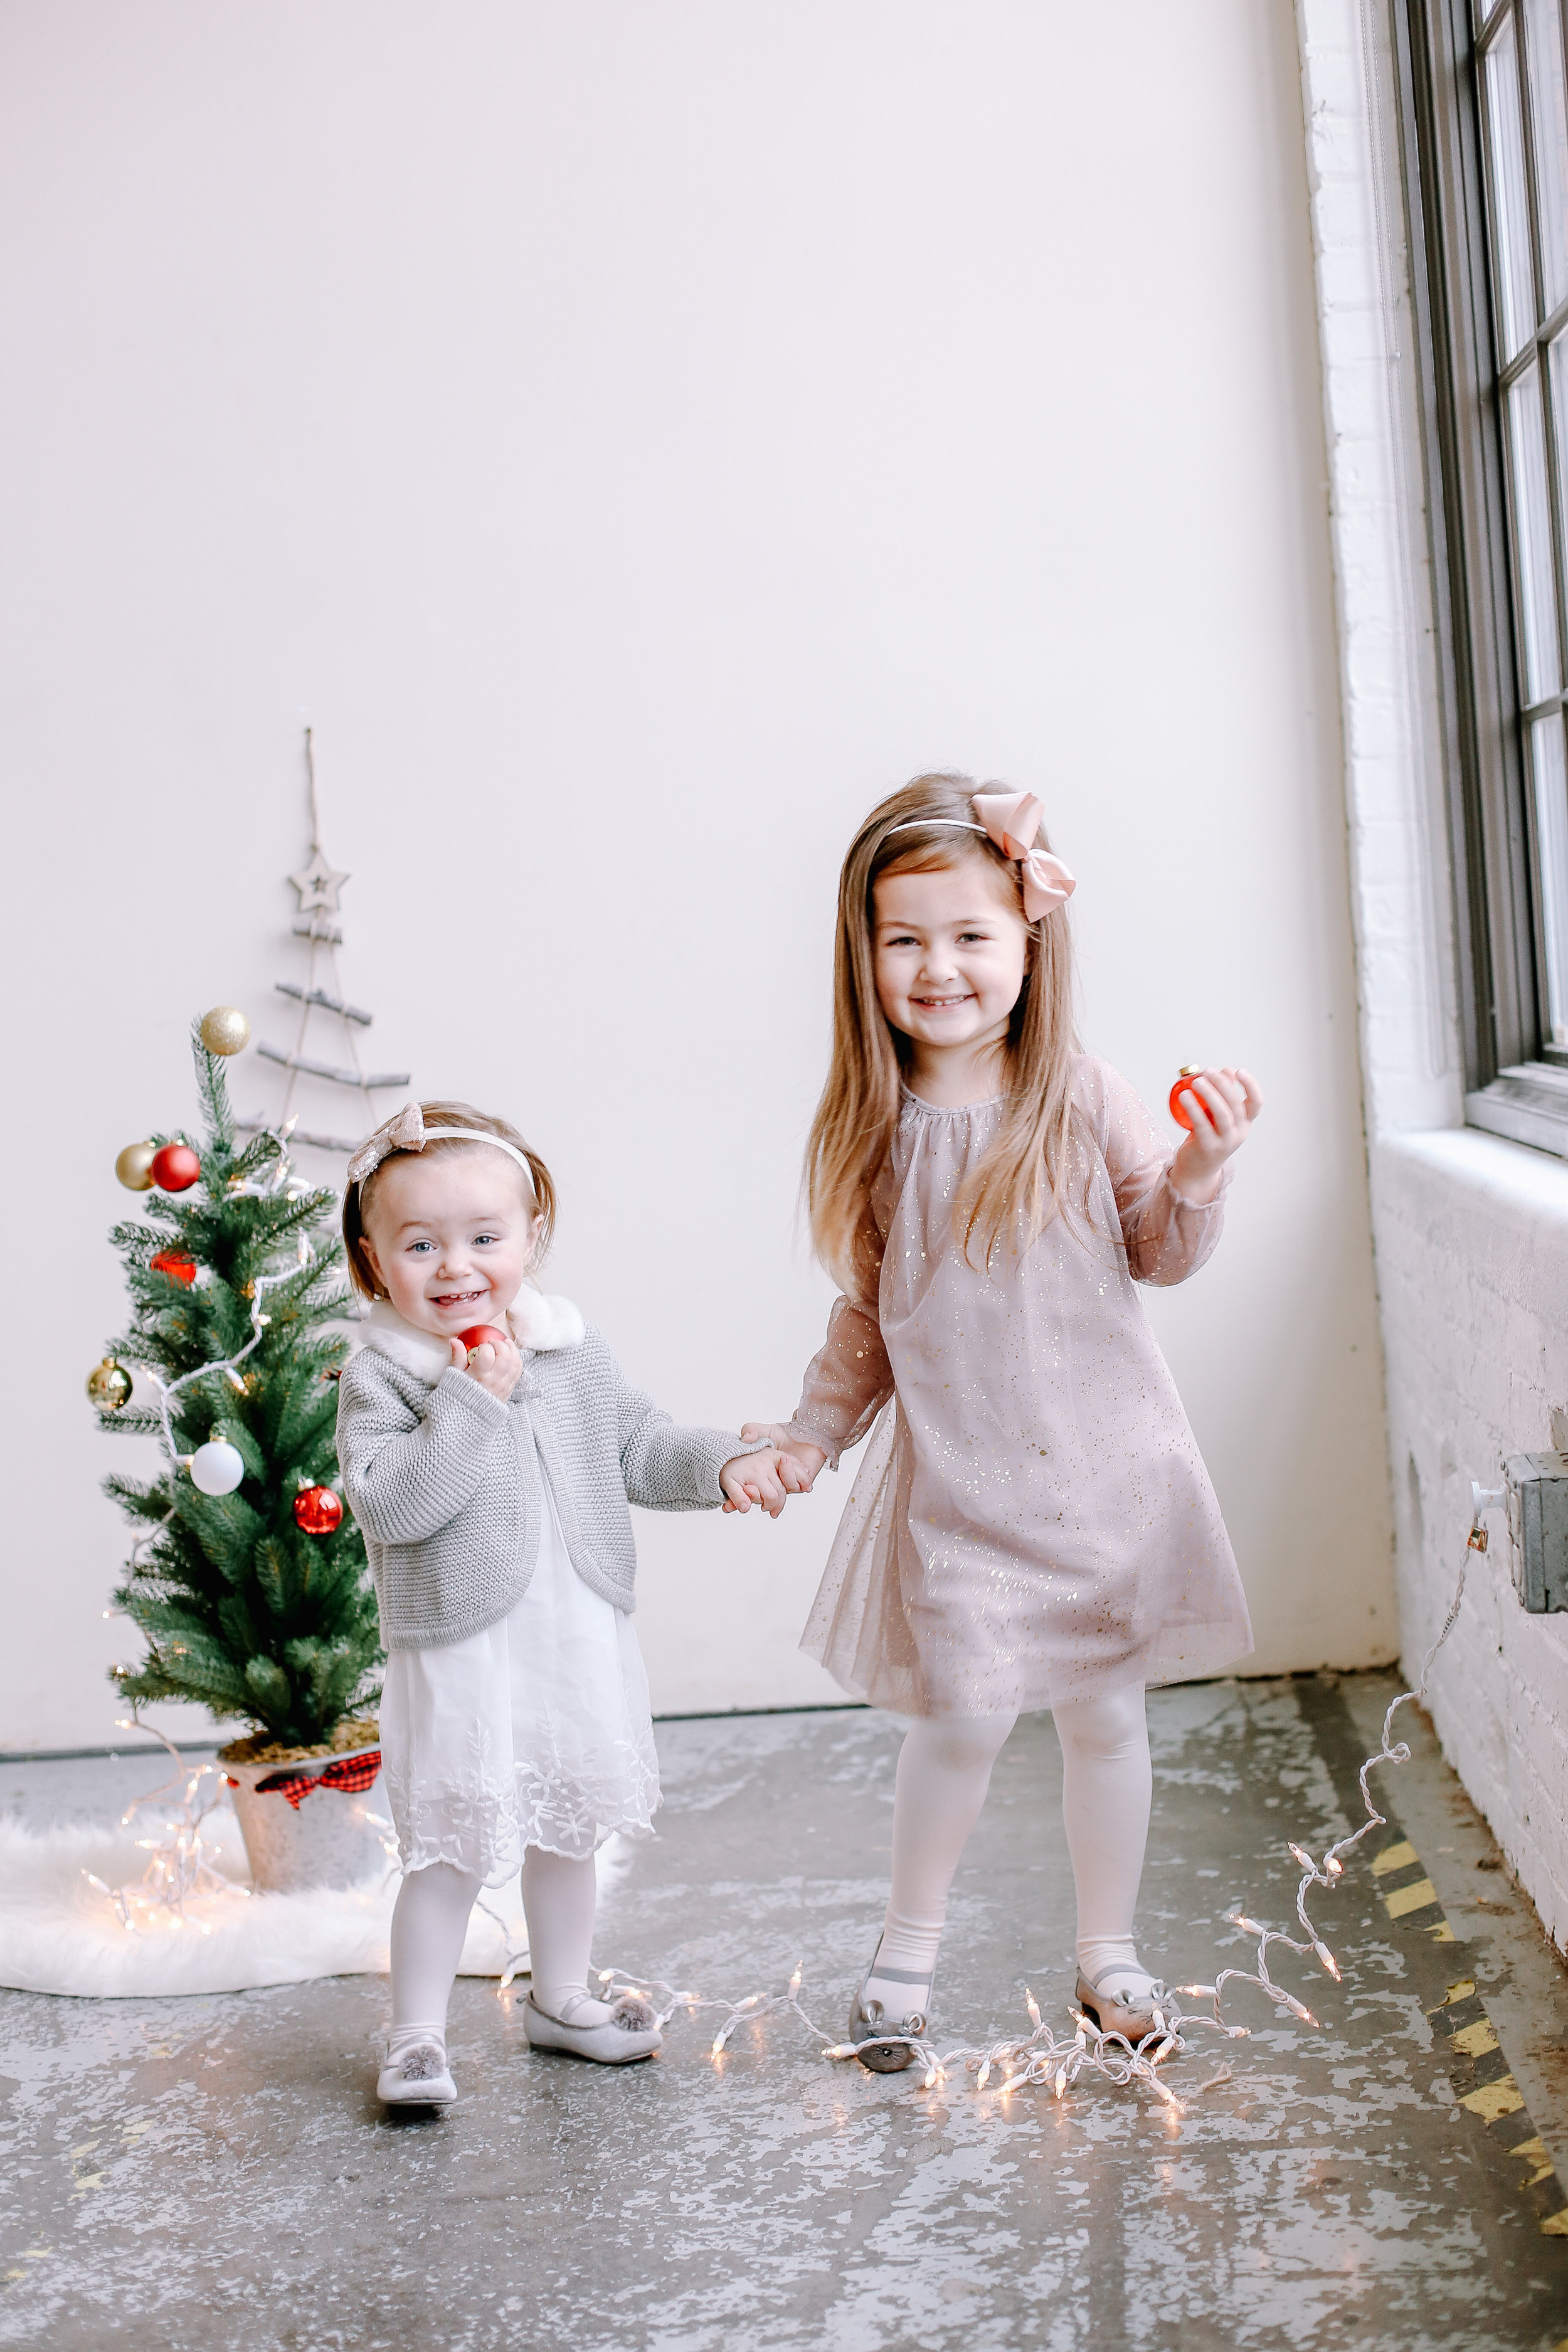 Christmas-52.jpg